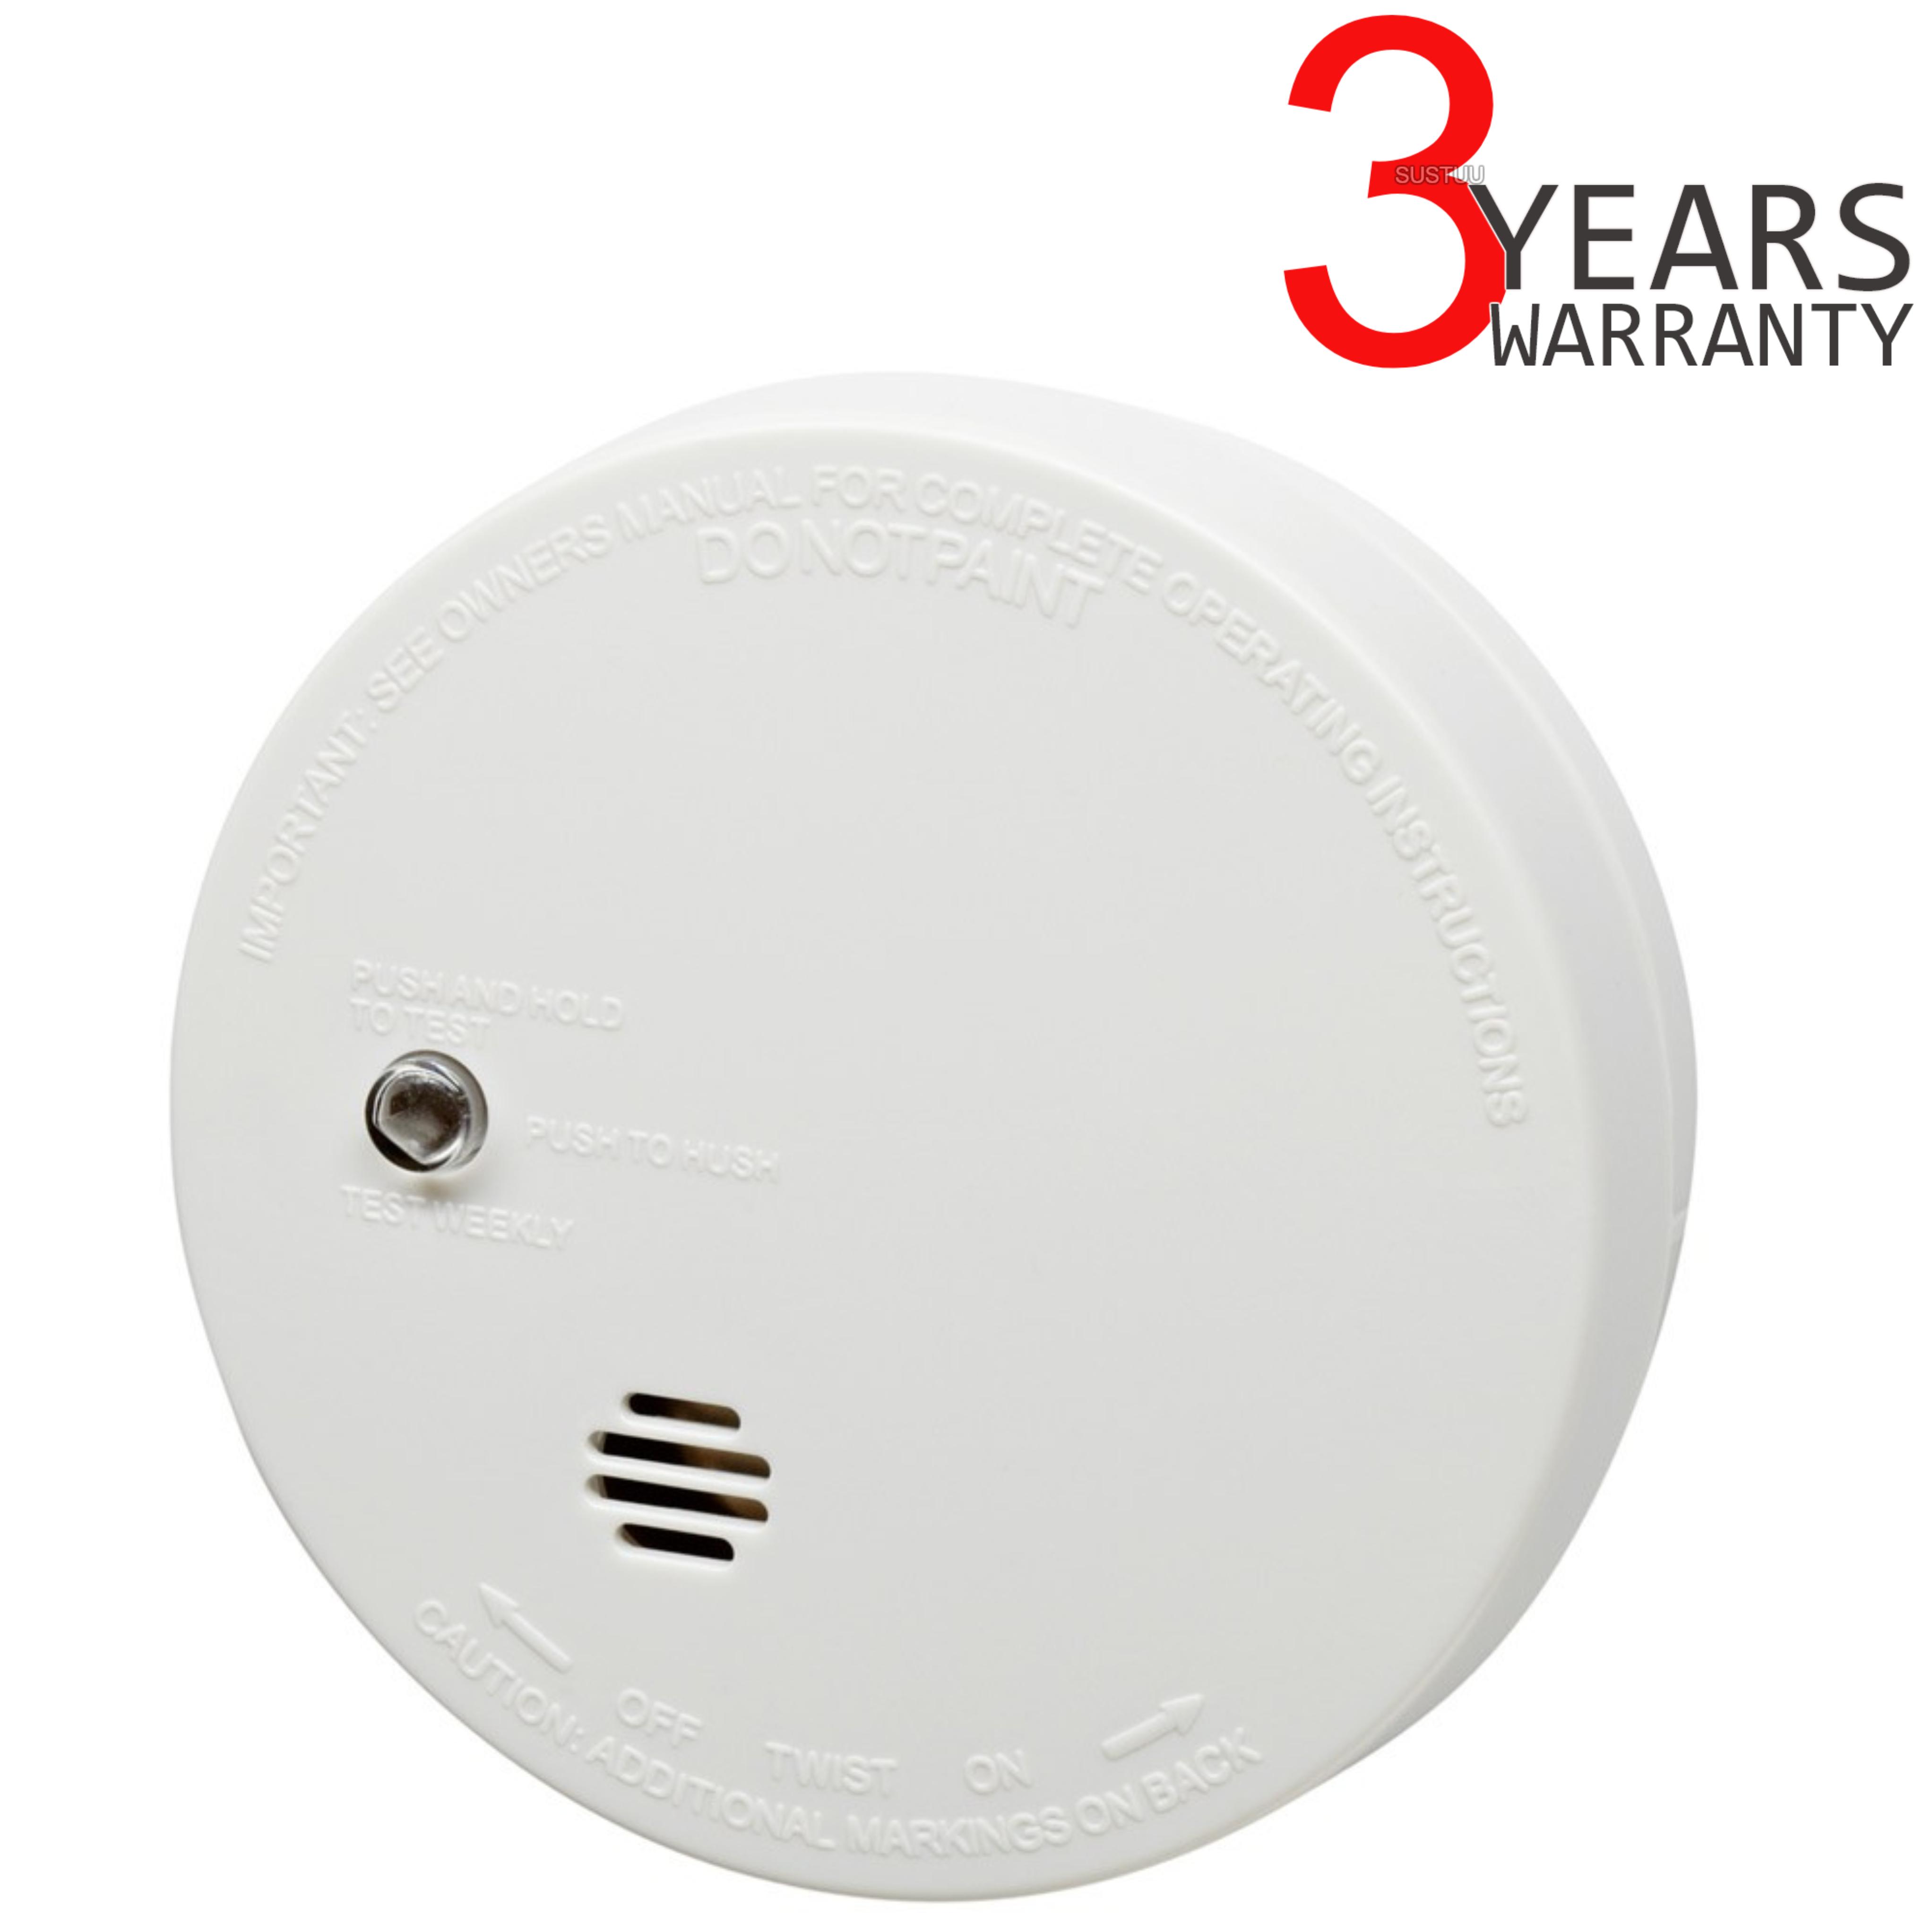 Kidde Lifesaver Compact Smoke Detector Alarm Battery Operated Burglar Powered By Ionisation Sensor